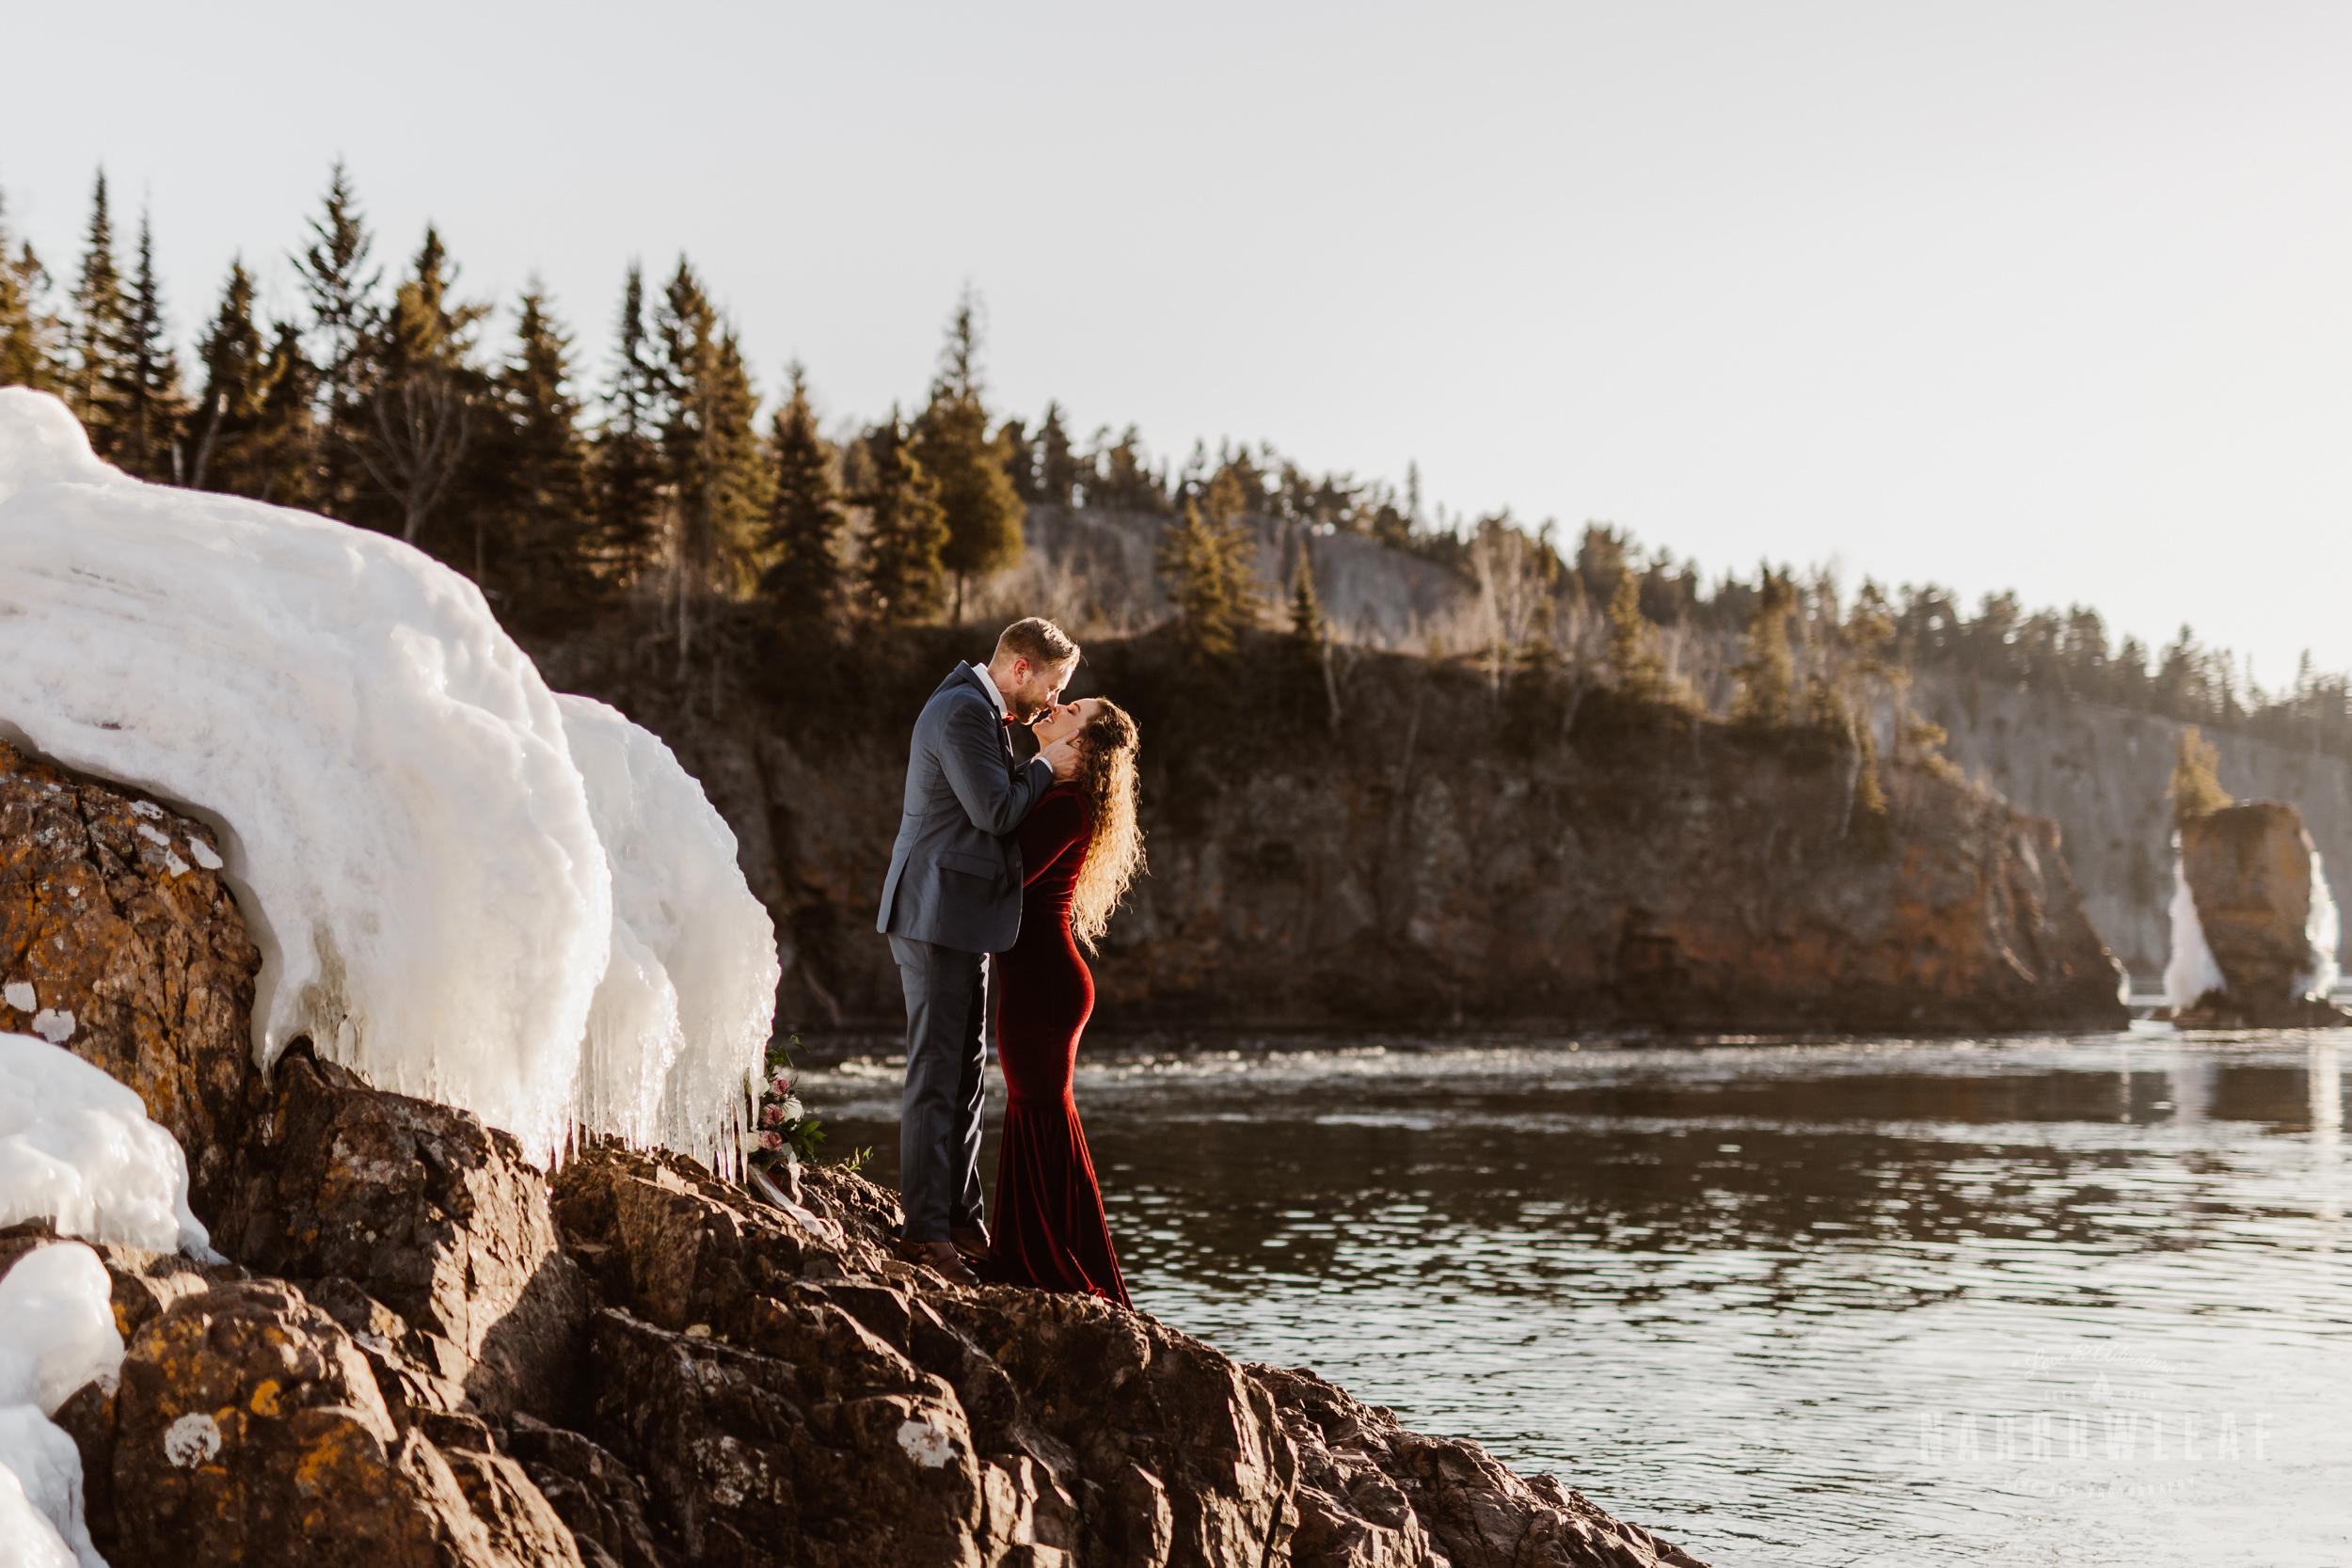 winter-adventure-elopement-tettegouche-state-park-minnesota-Narrowleaf_Love_and_Adventure_Photography-8629.jpg